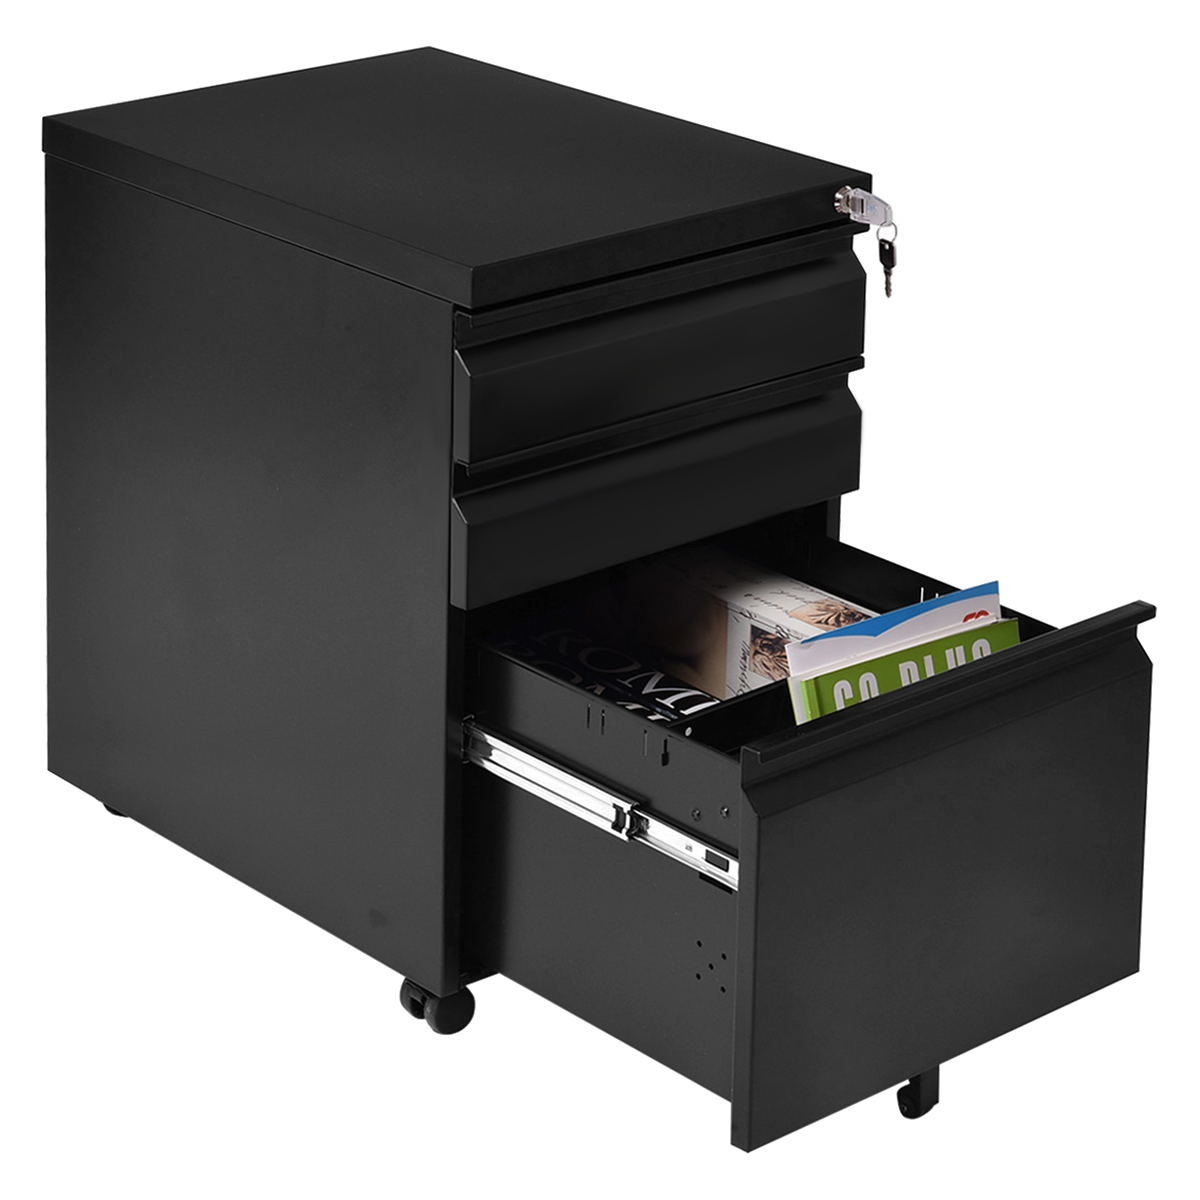 3 Drawers Rolling File Storage Cabinet-Black